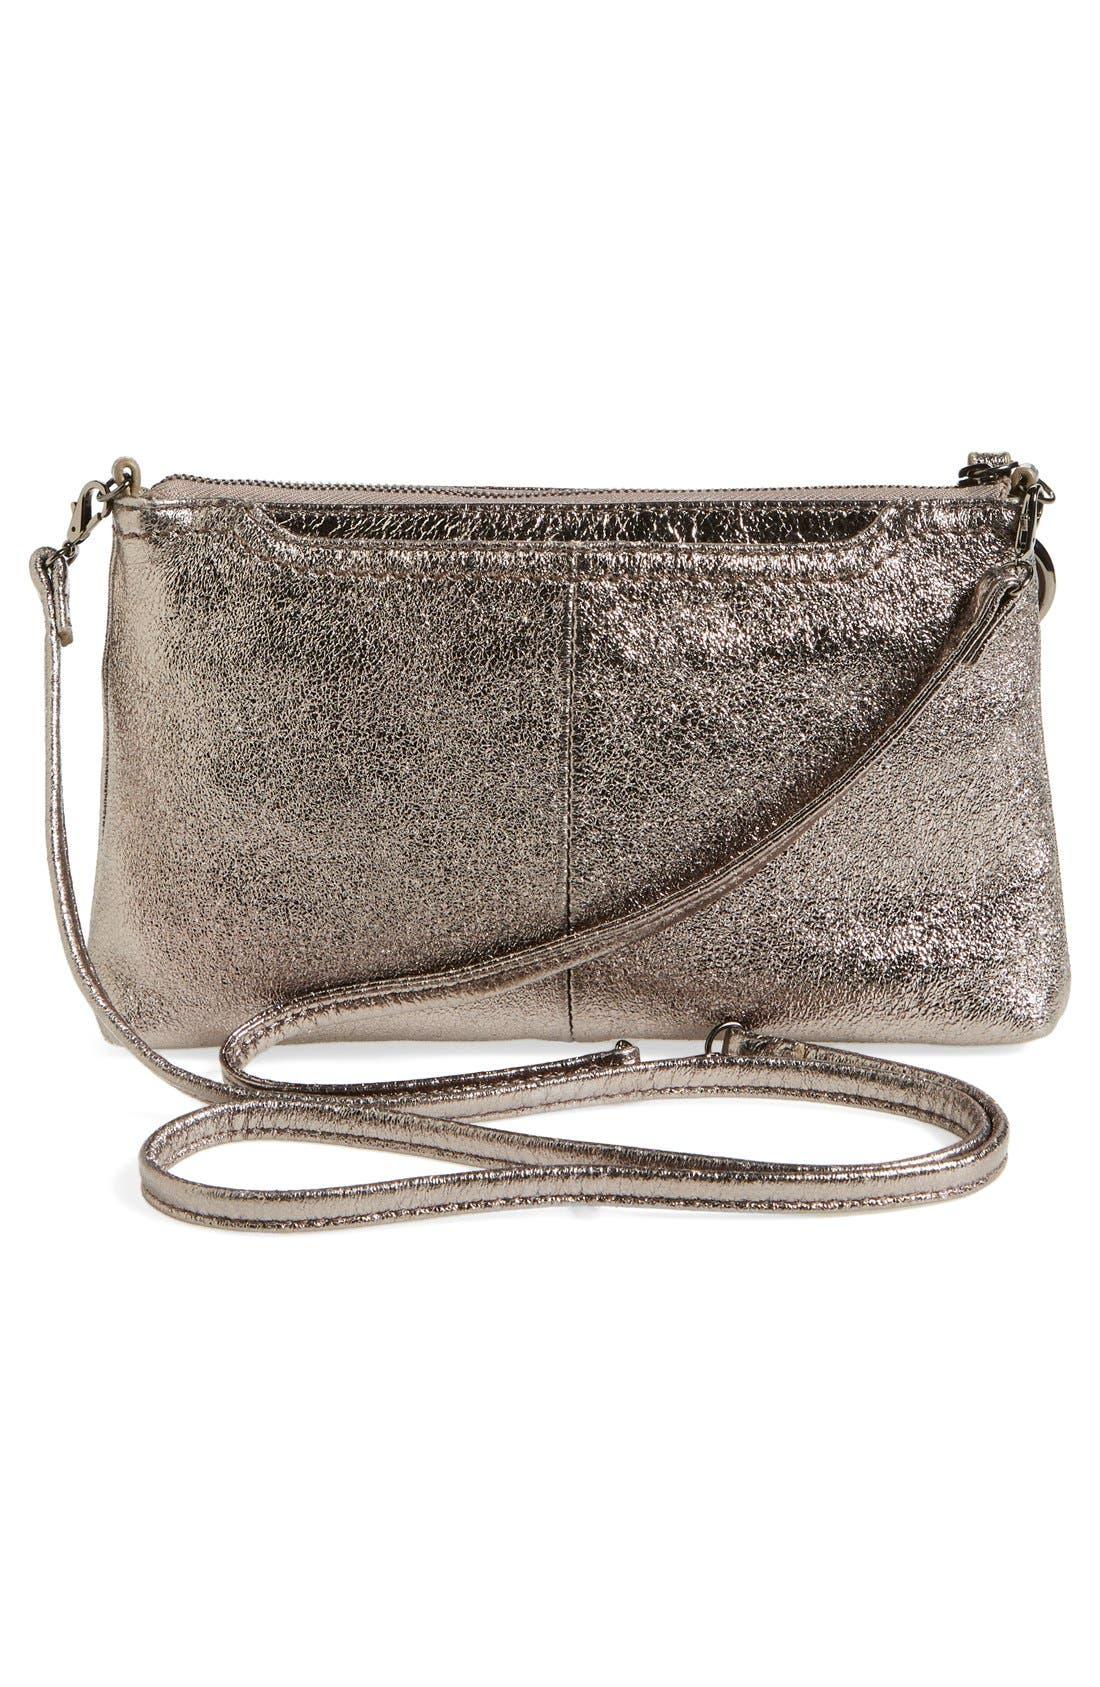 Alternate Image 3  - Hobo 'Darcy' Leather Crossbody Bag